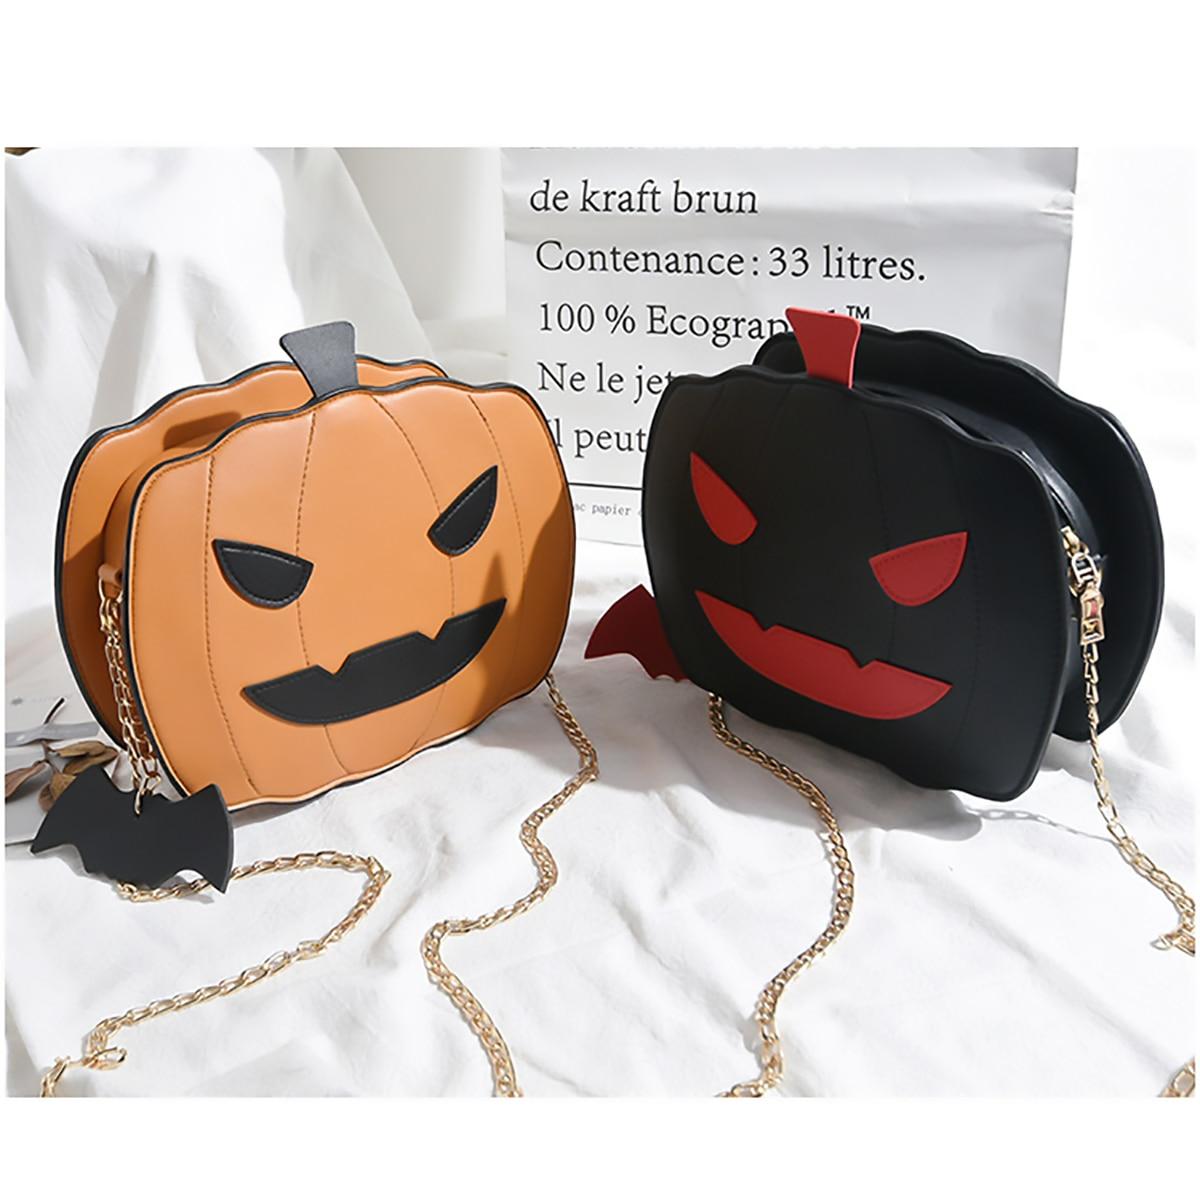 Shoulder Bag Pumpkin Bag For Women Pu Leather Creativity Easter Halloween Lamp Handbags New Designed  Cross Body Bags Gift 1